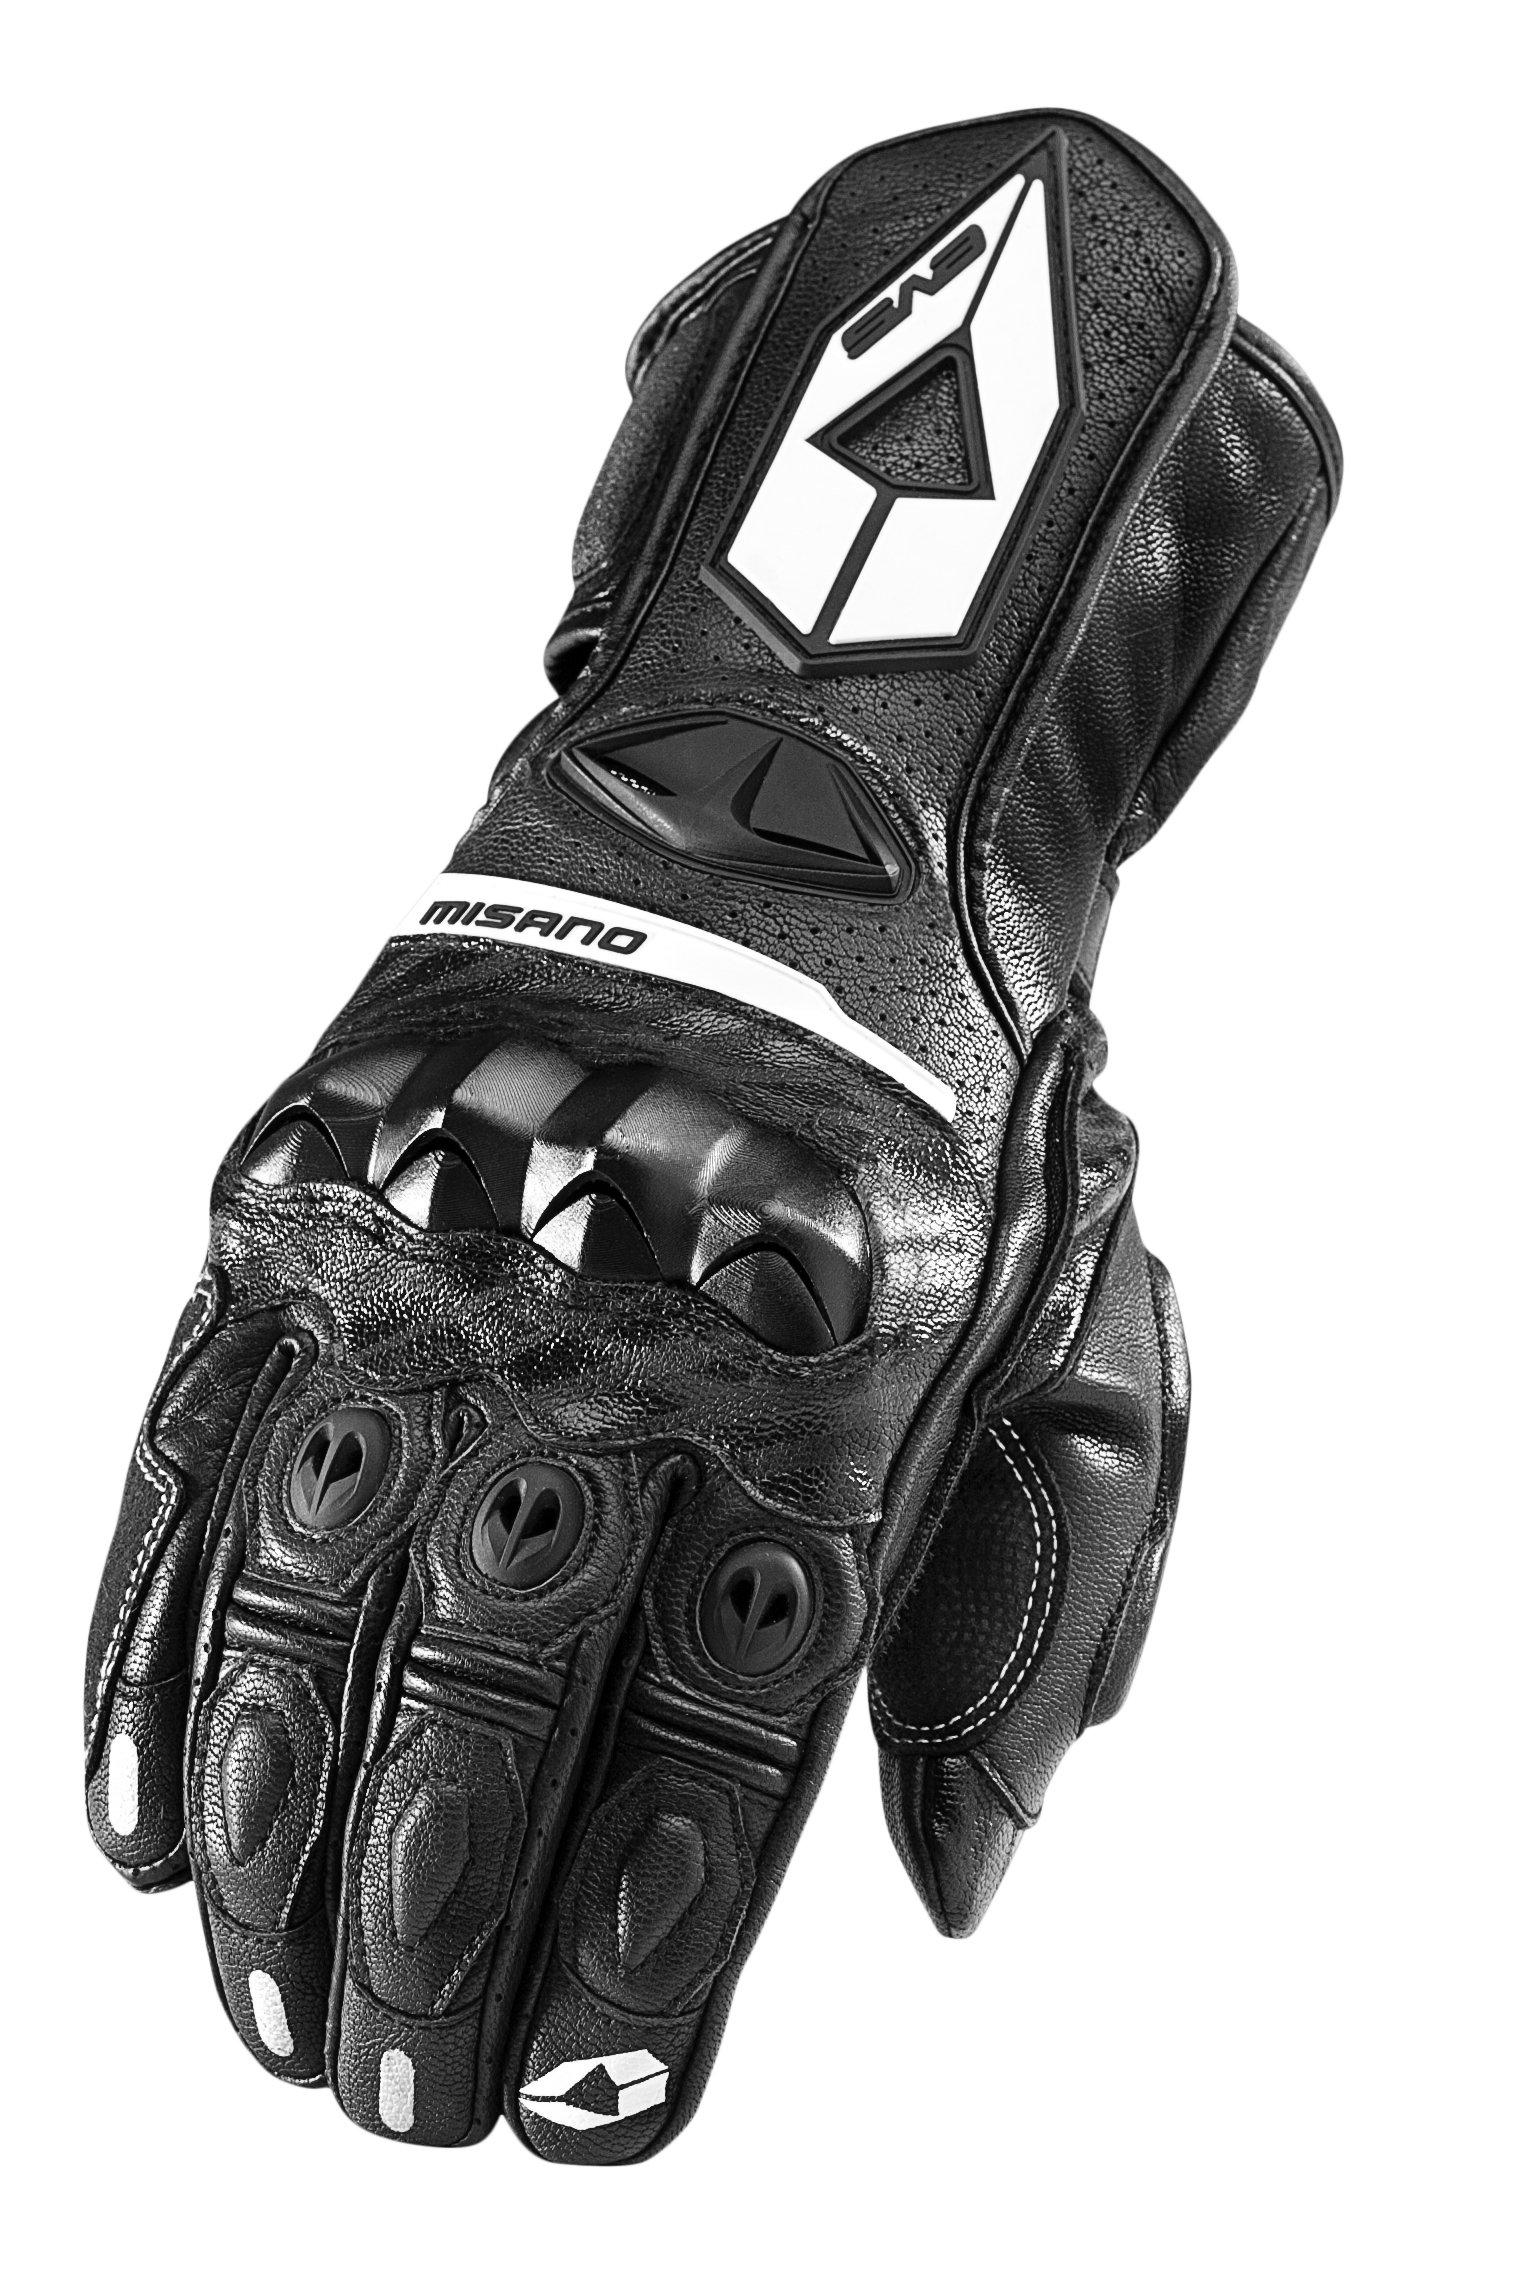 EVS Sports Misano Street Gloves (Black, Large)